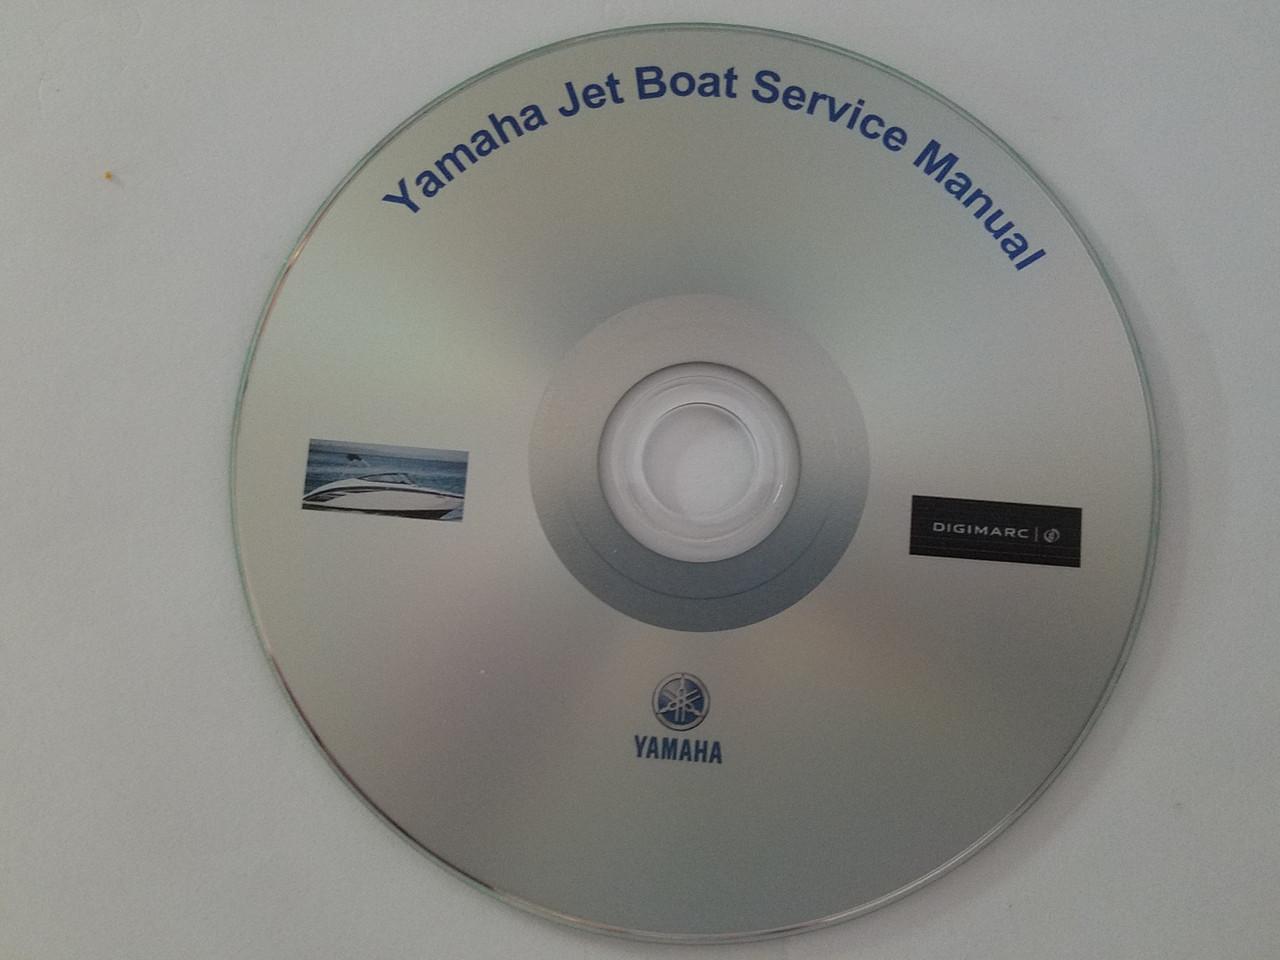 Yamaha Jet Boat Manuals